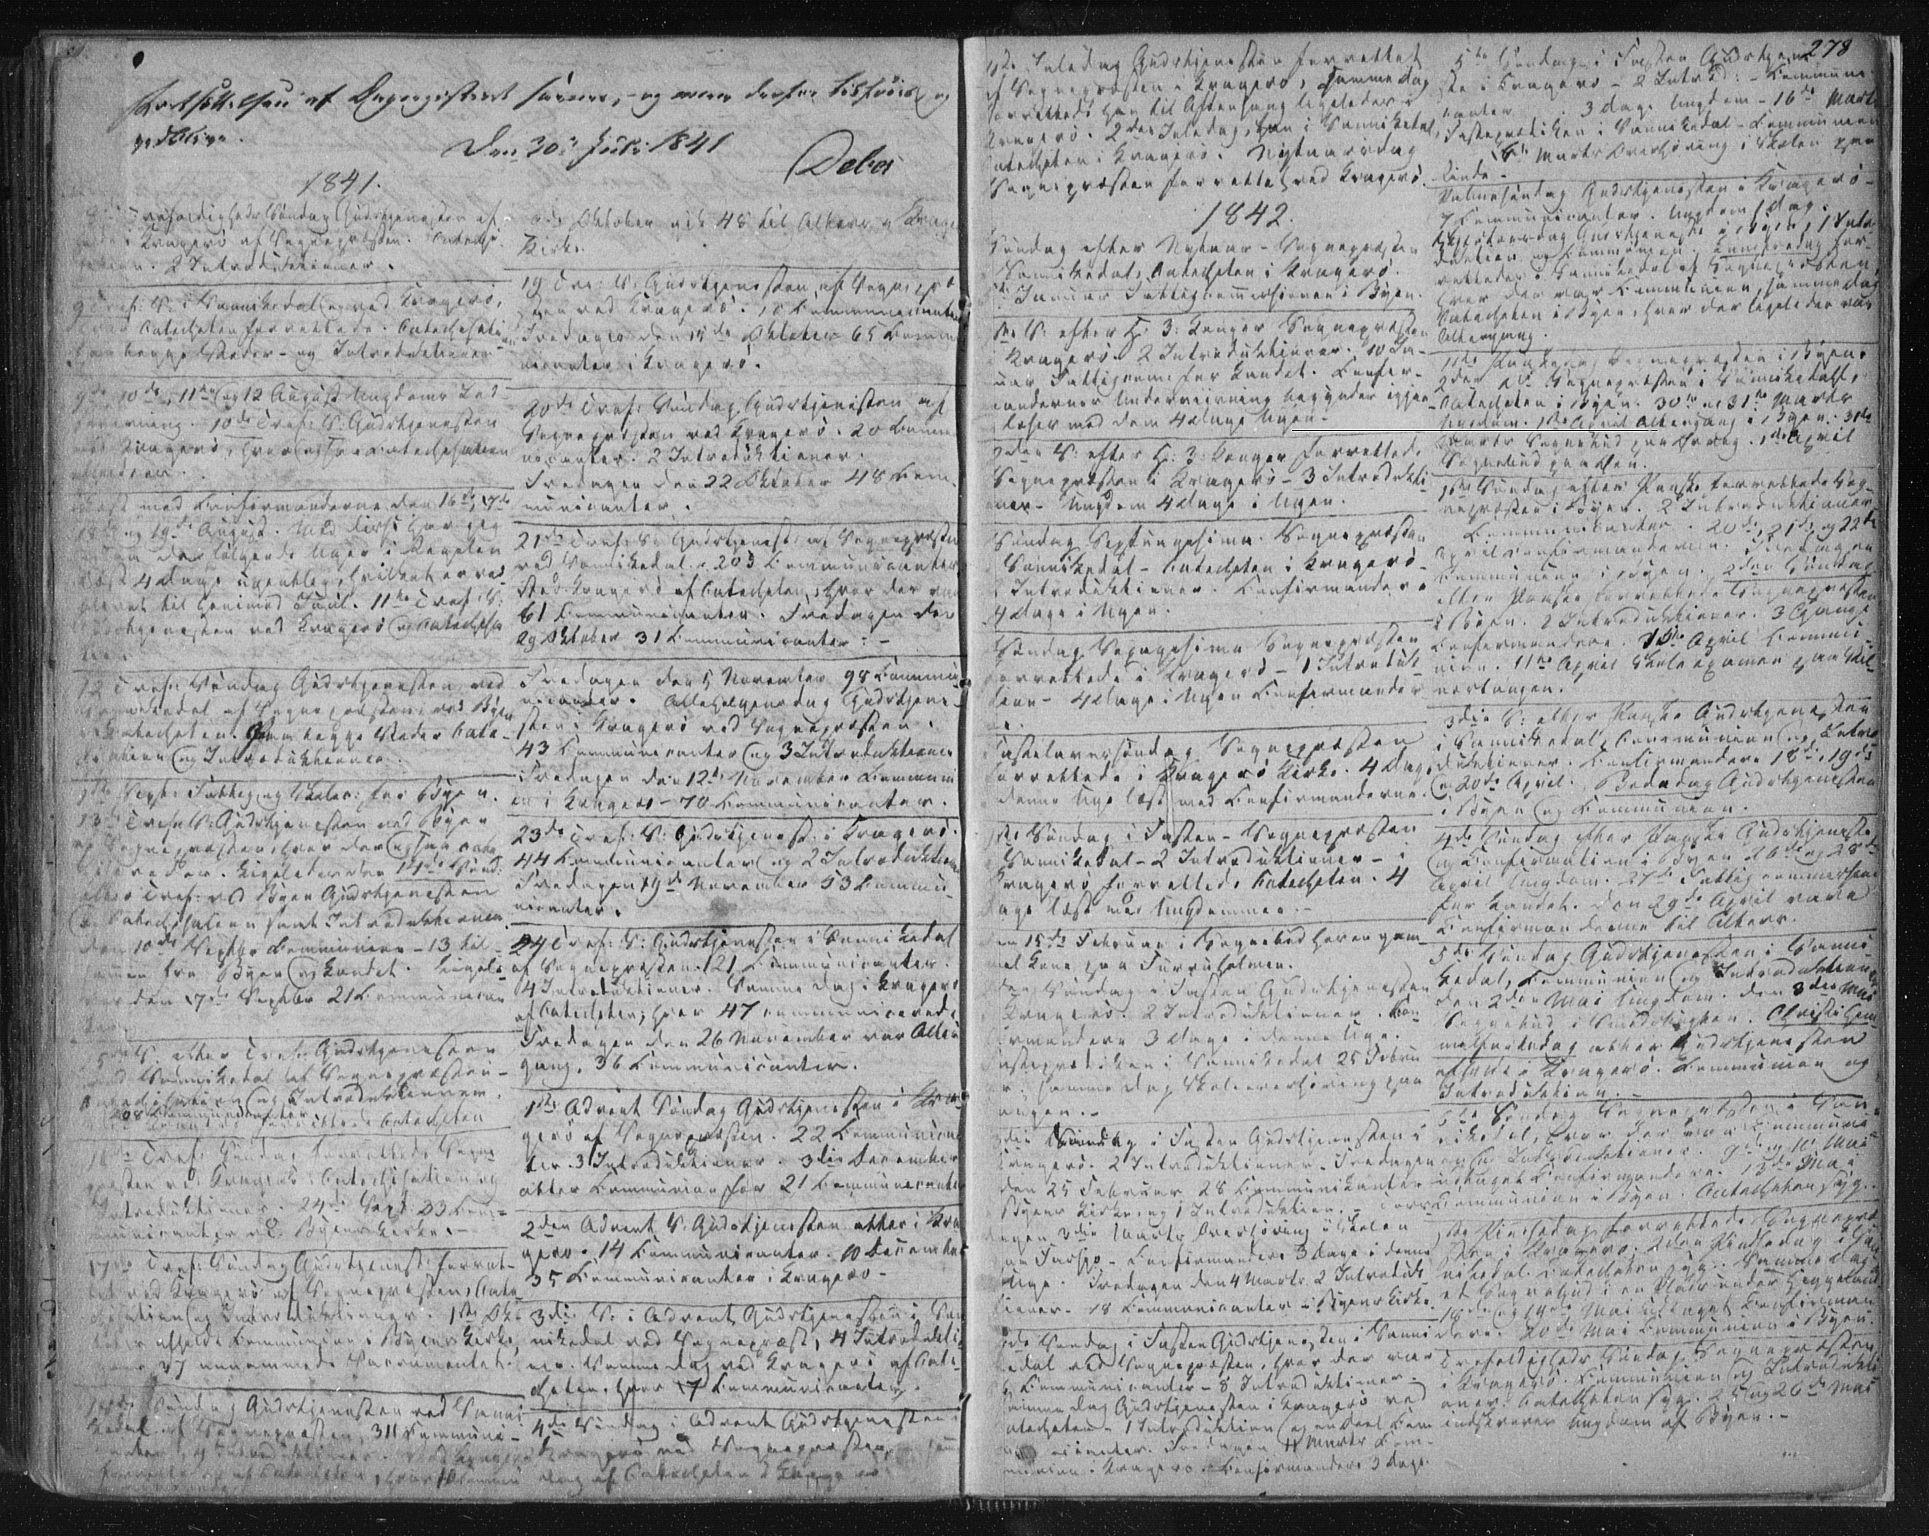 SAKO, Kragerø kirkebøker, F/Fa/L0005: Ministerialbok nr. 5, 1832-1847, s. 278